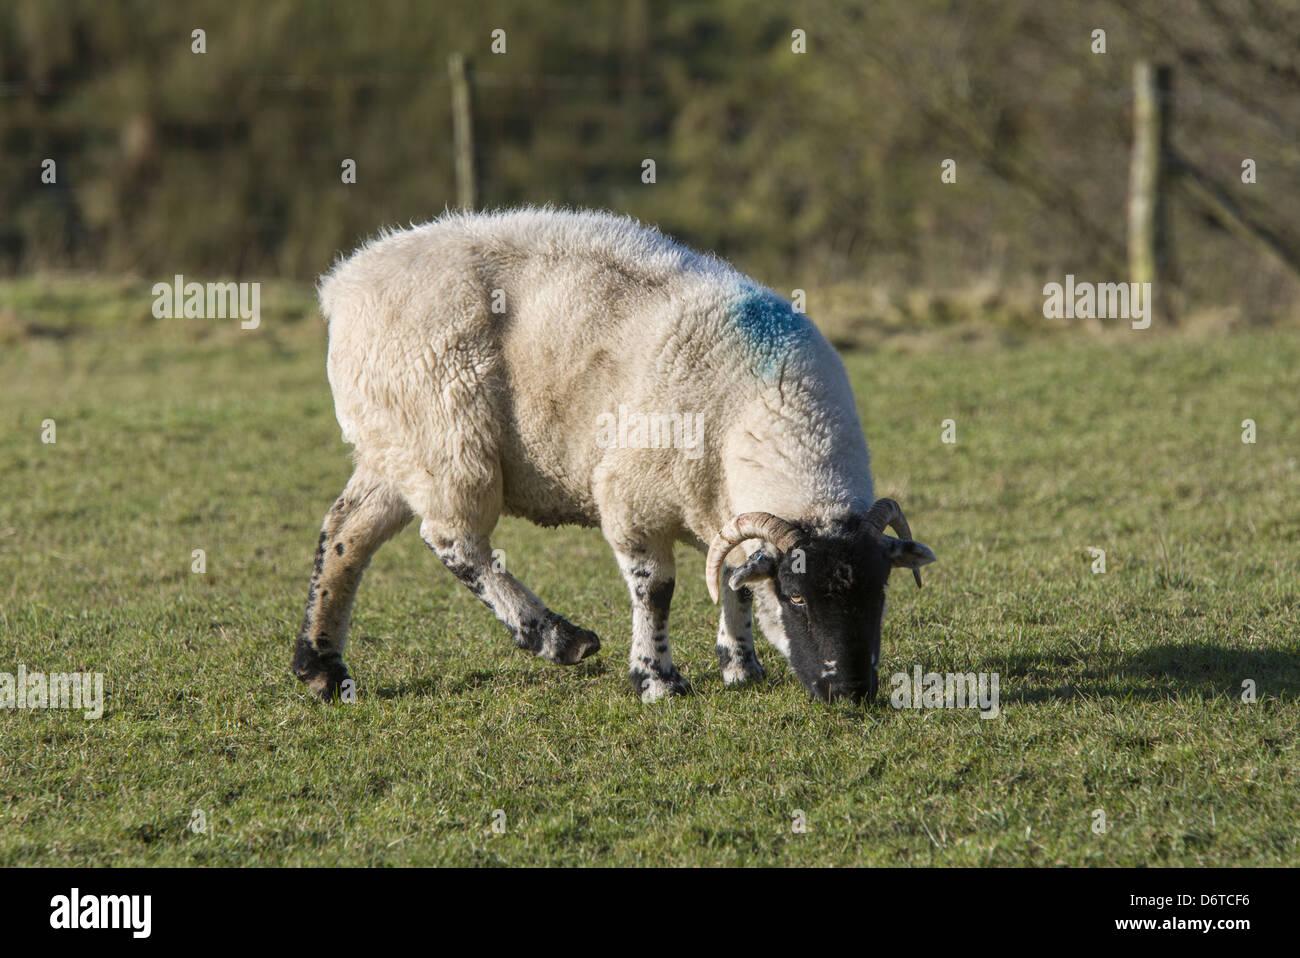 Domestic Sheep, Lonk ewe, lame, grazing in pasture, Lancashire, England, December - Stock Image